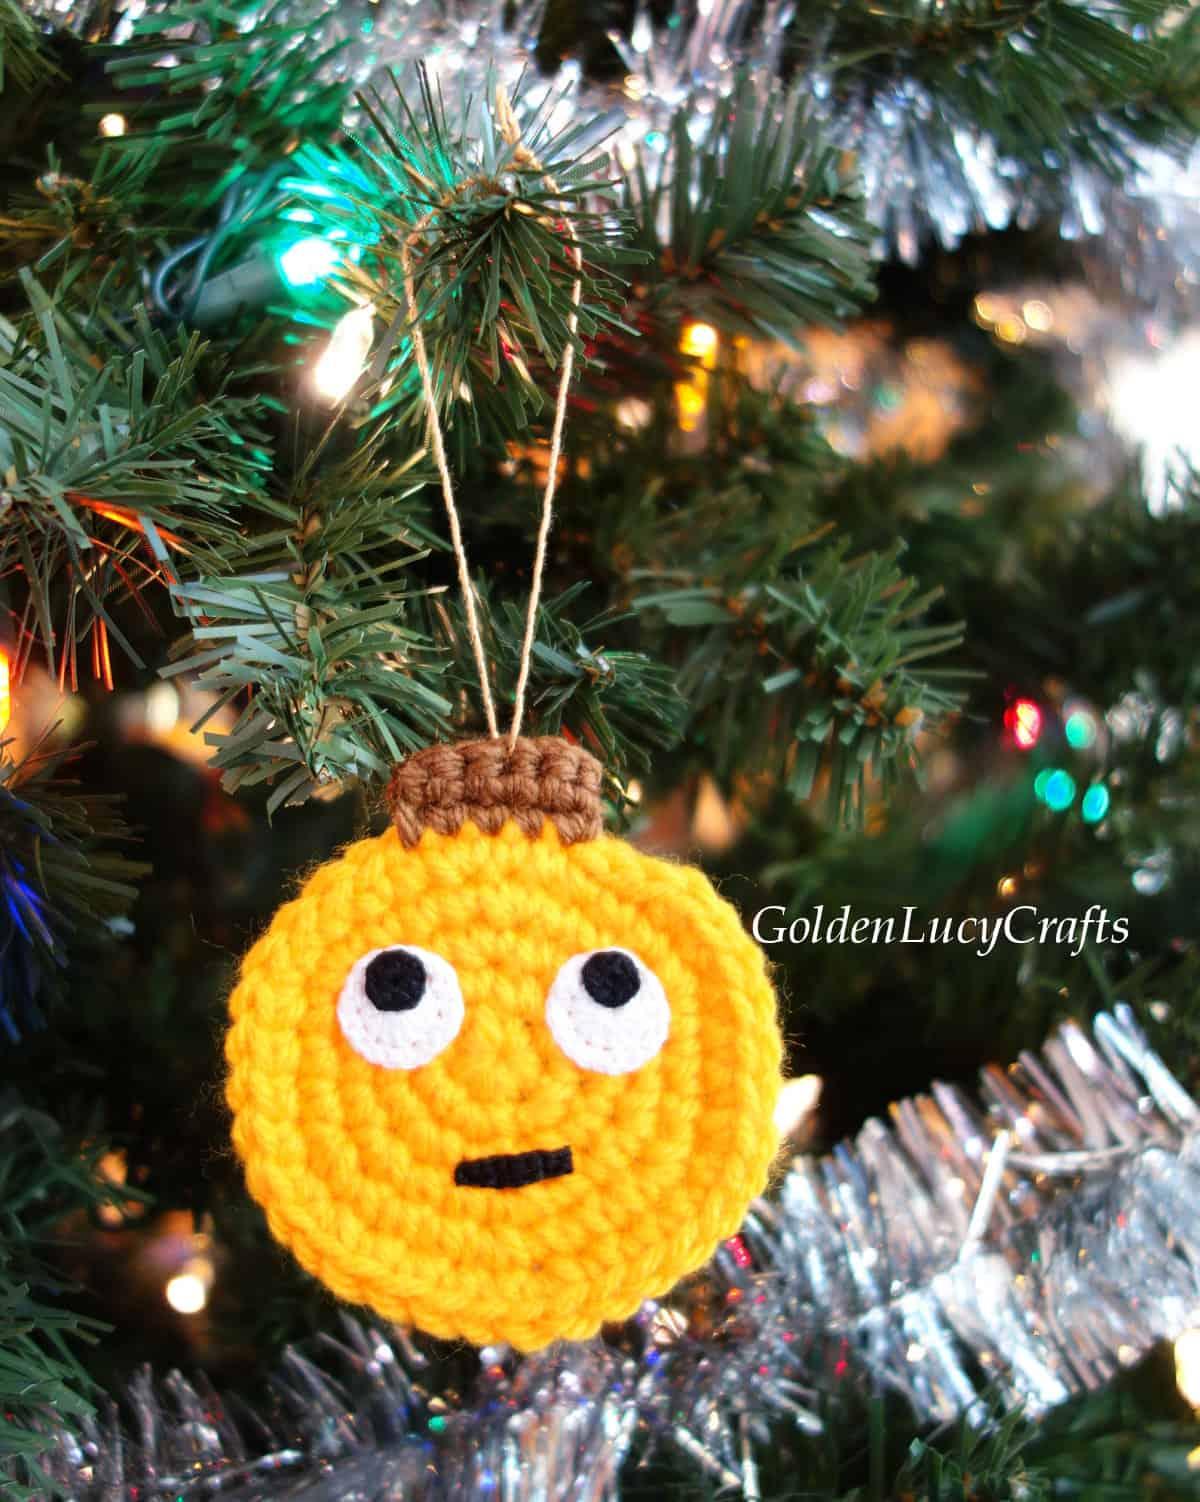 Crochet rolling eyes emoji Christmas ornament hanging on the Christmas tree.